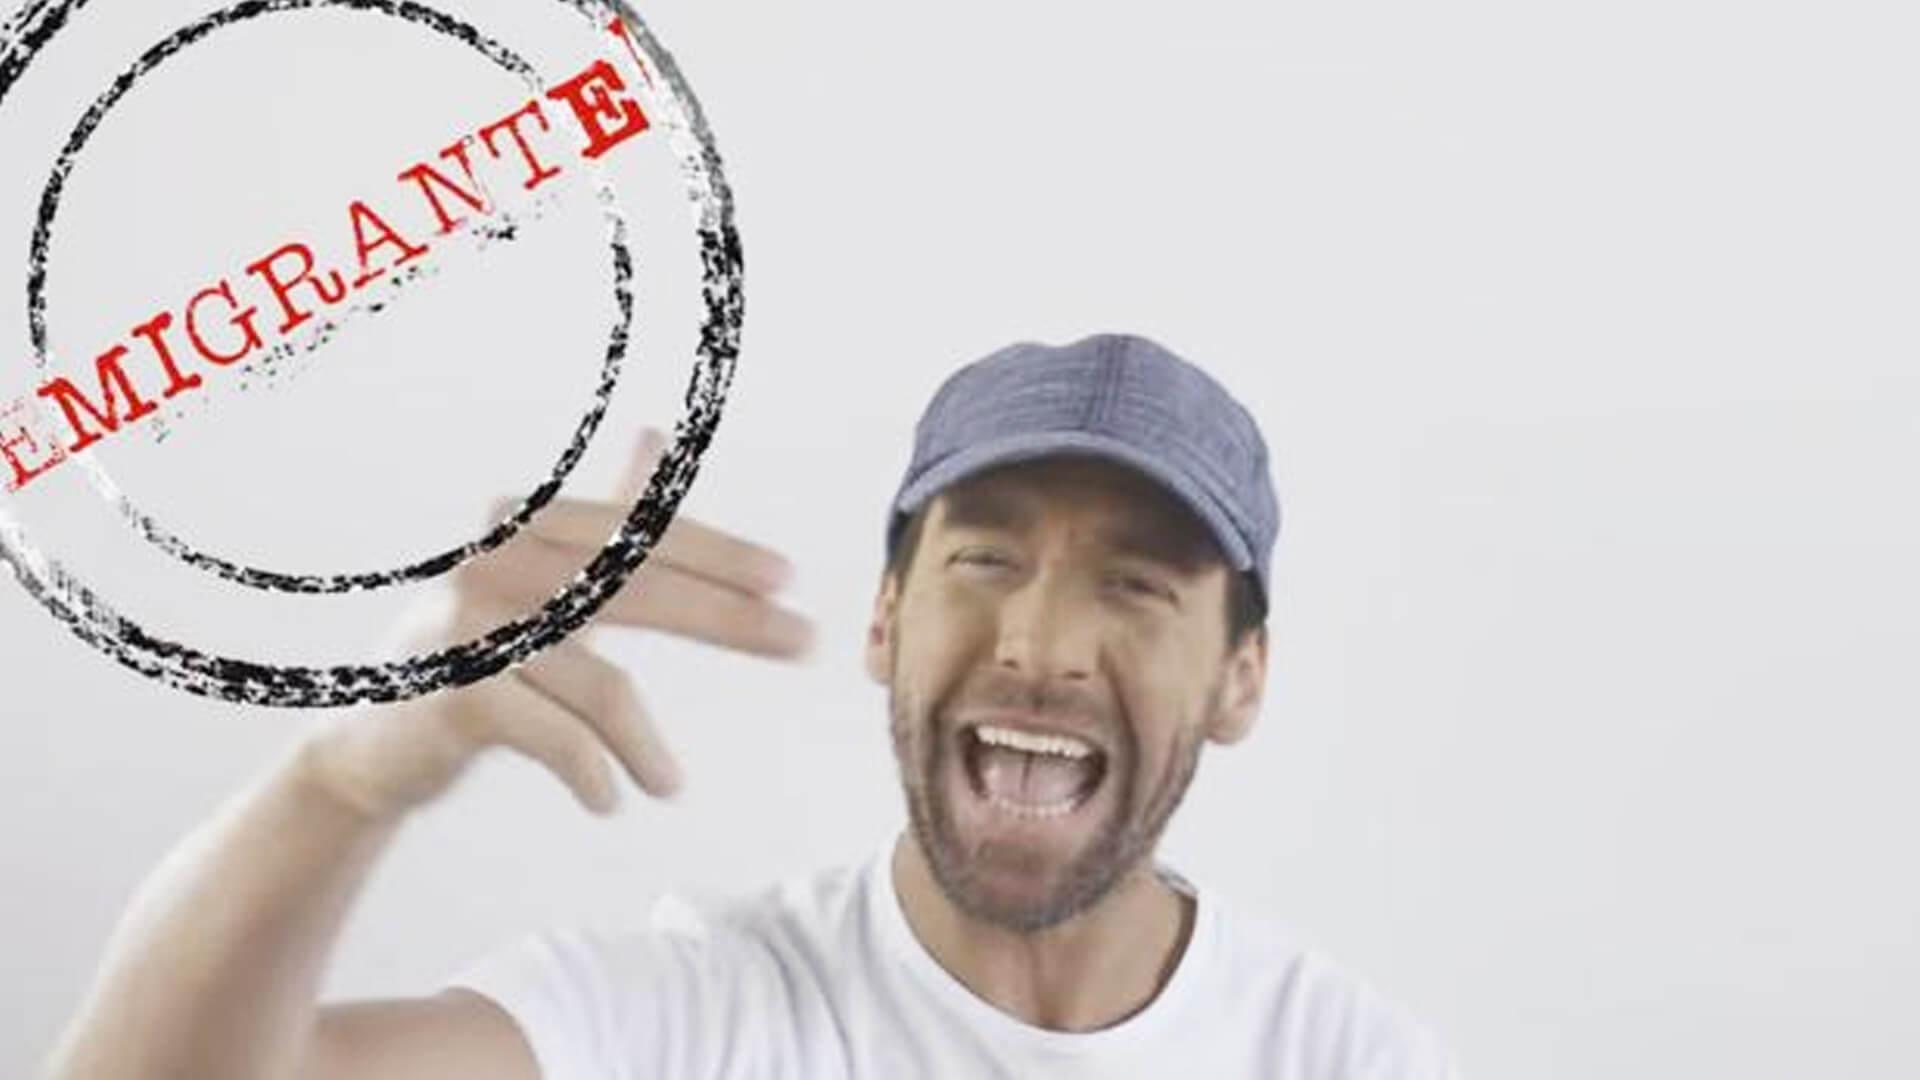 Pedro Caxade music video